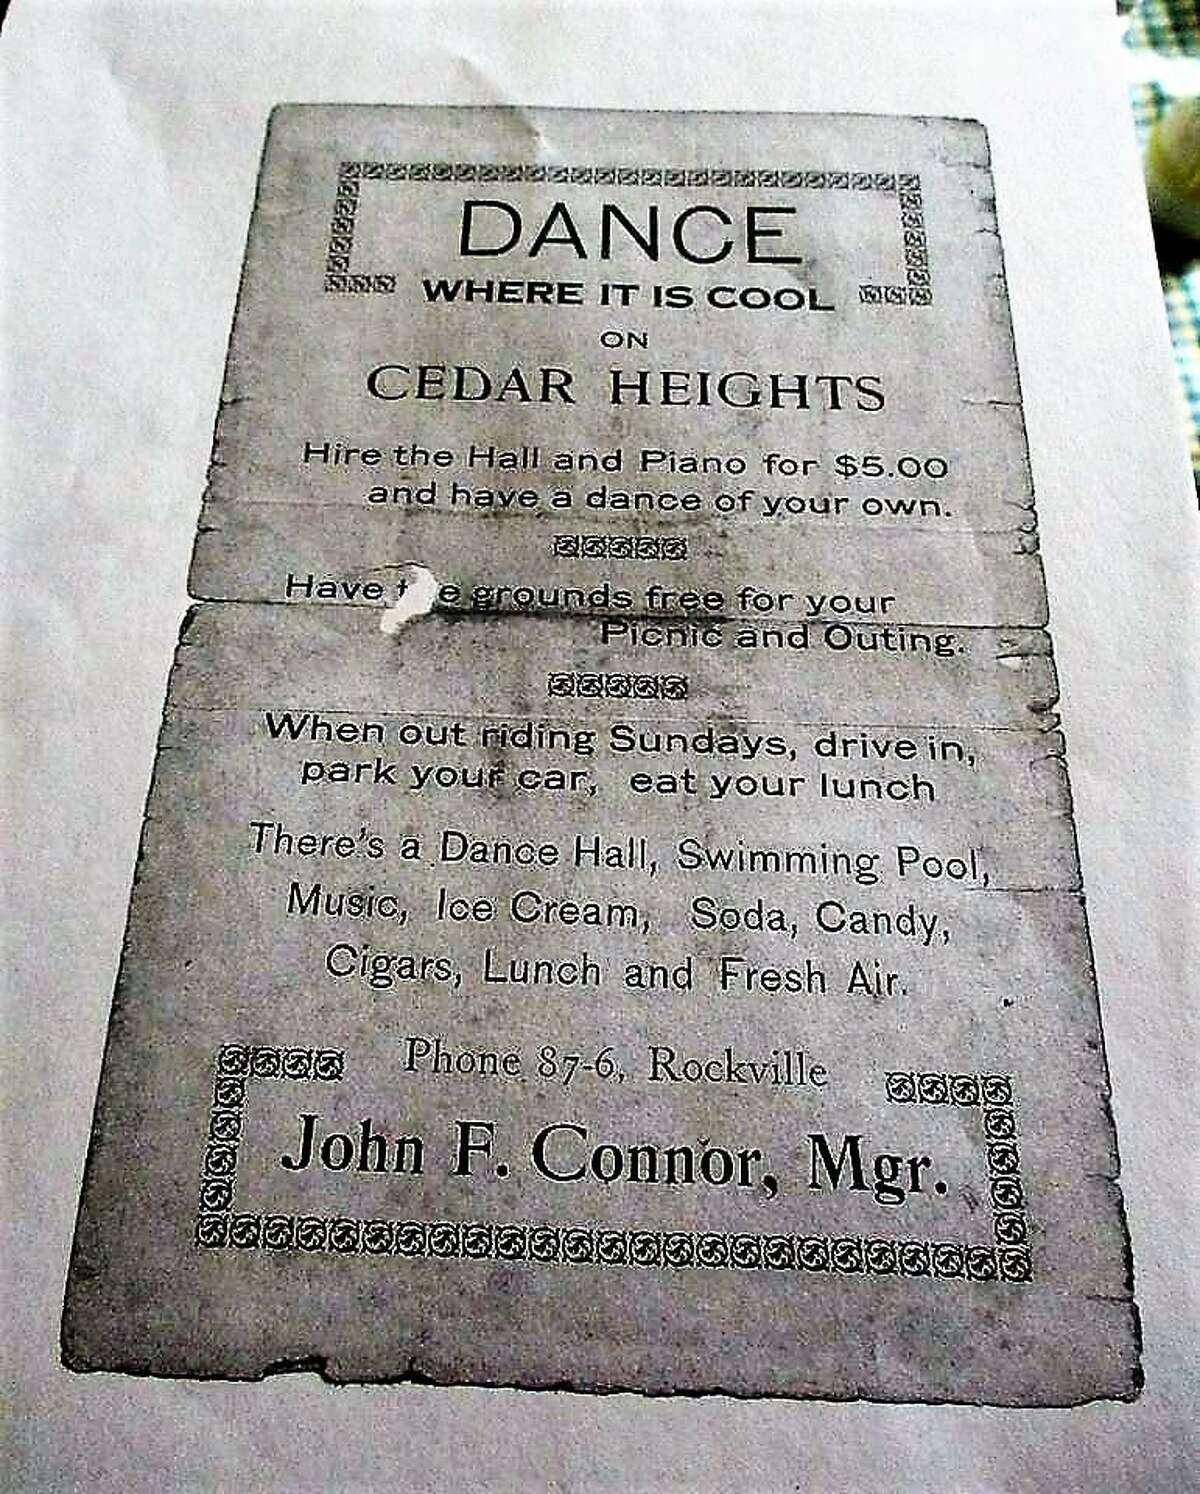 Flyer from Cedar Heights resort, around 1920